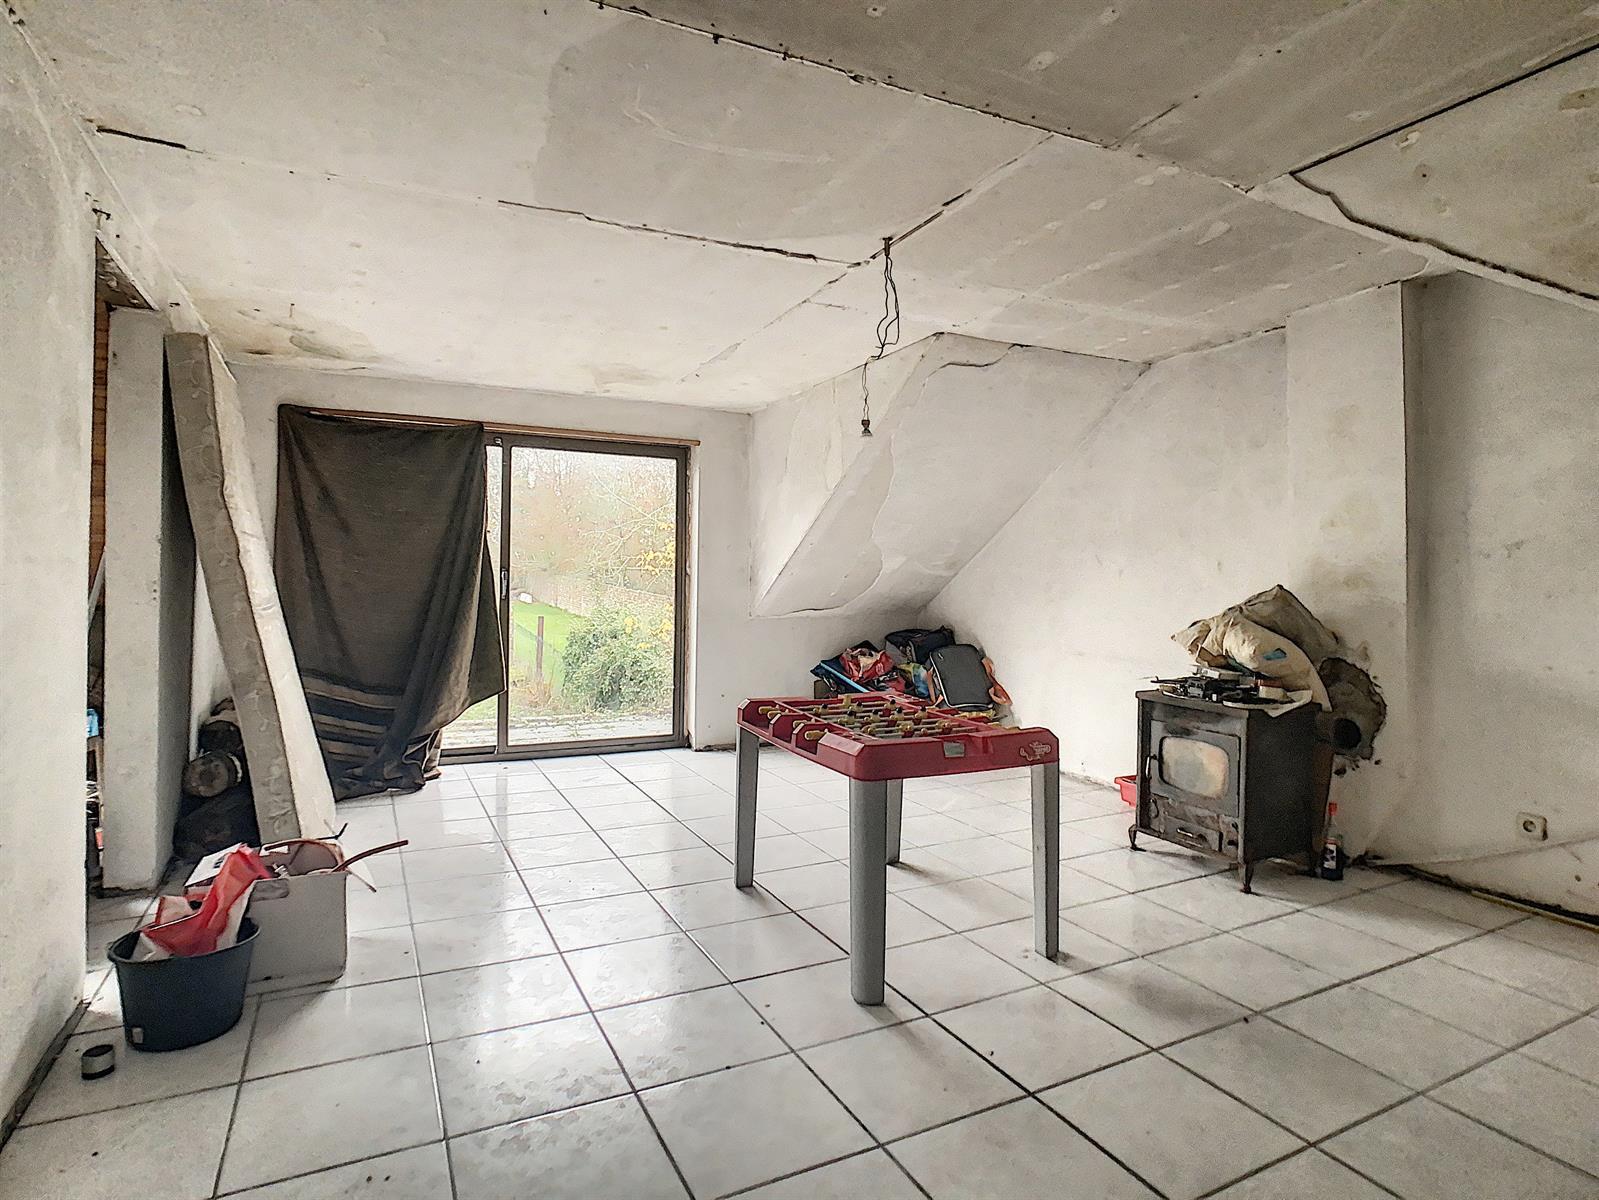 Entrepôt - Villersla-Ville Marbais - #4407525-25